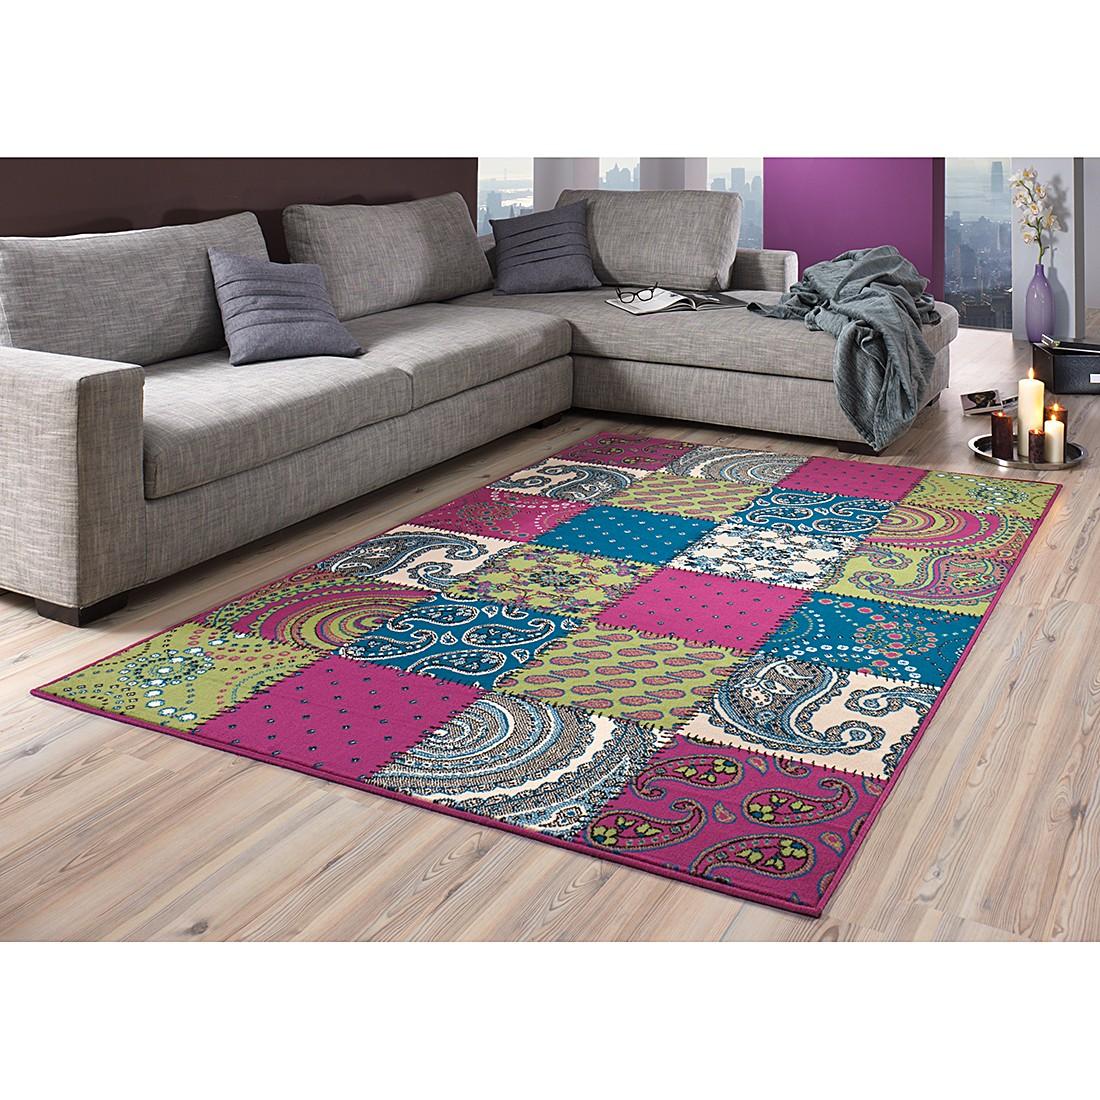 Teppich Prime Pile – Grün/Lila – 70 x 140 cm, Hanse Home Collection günstig kaufen